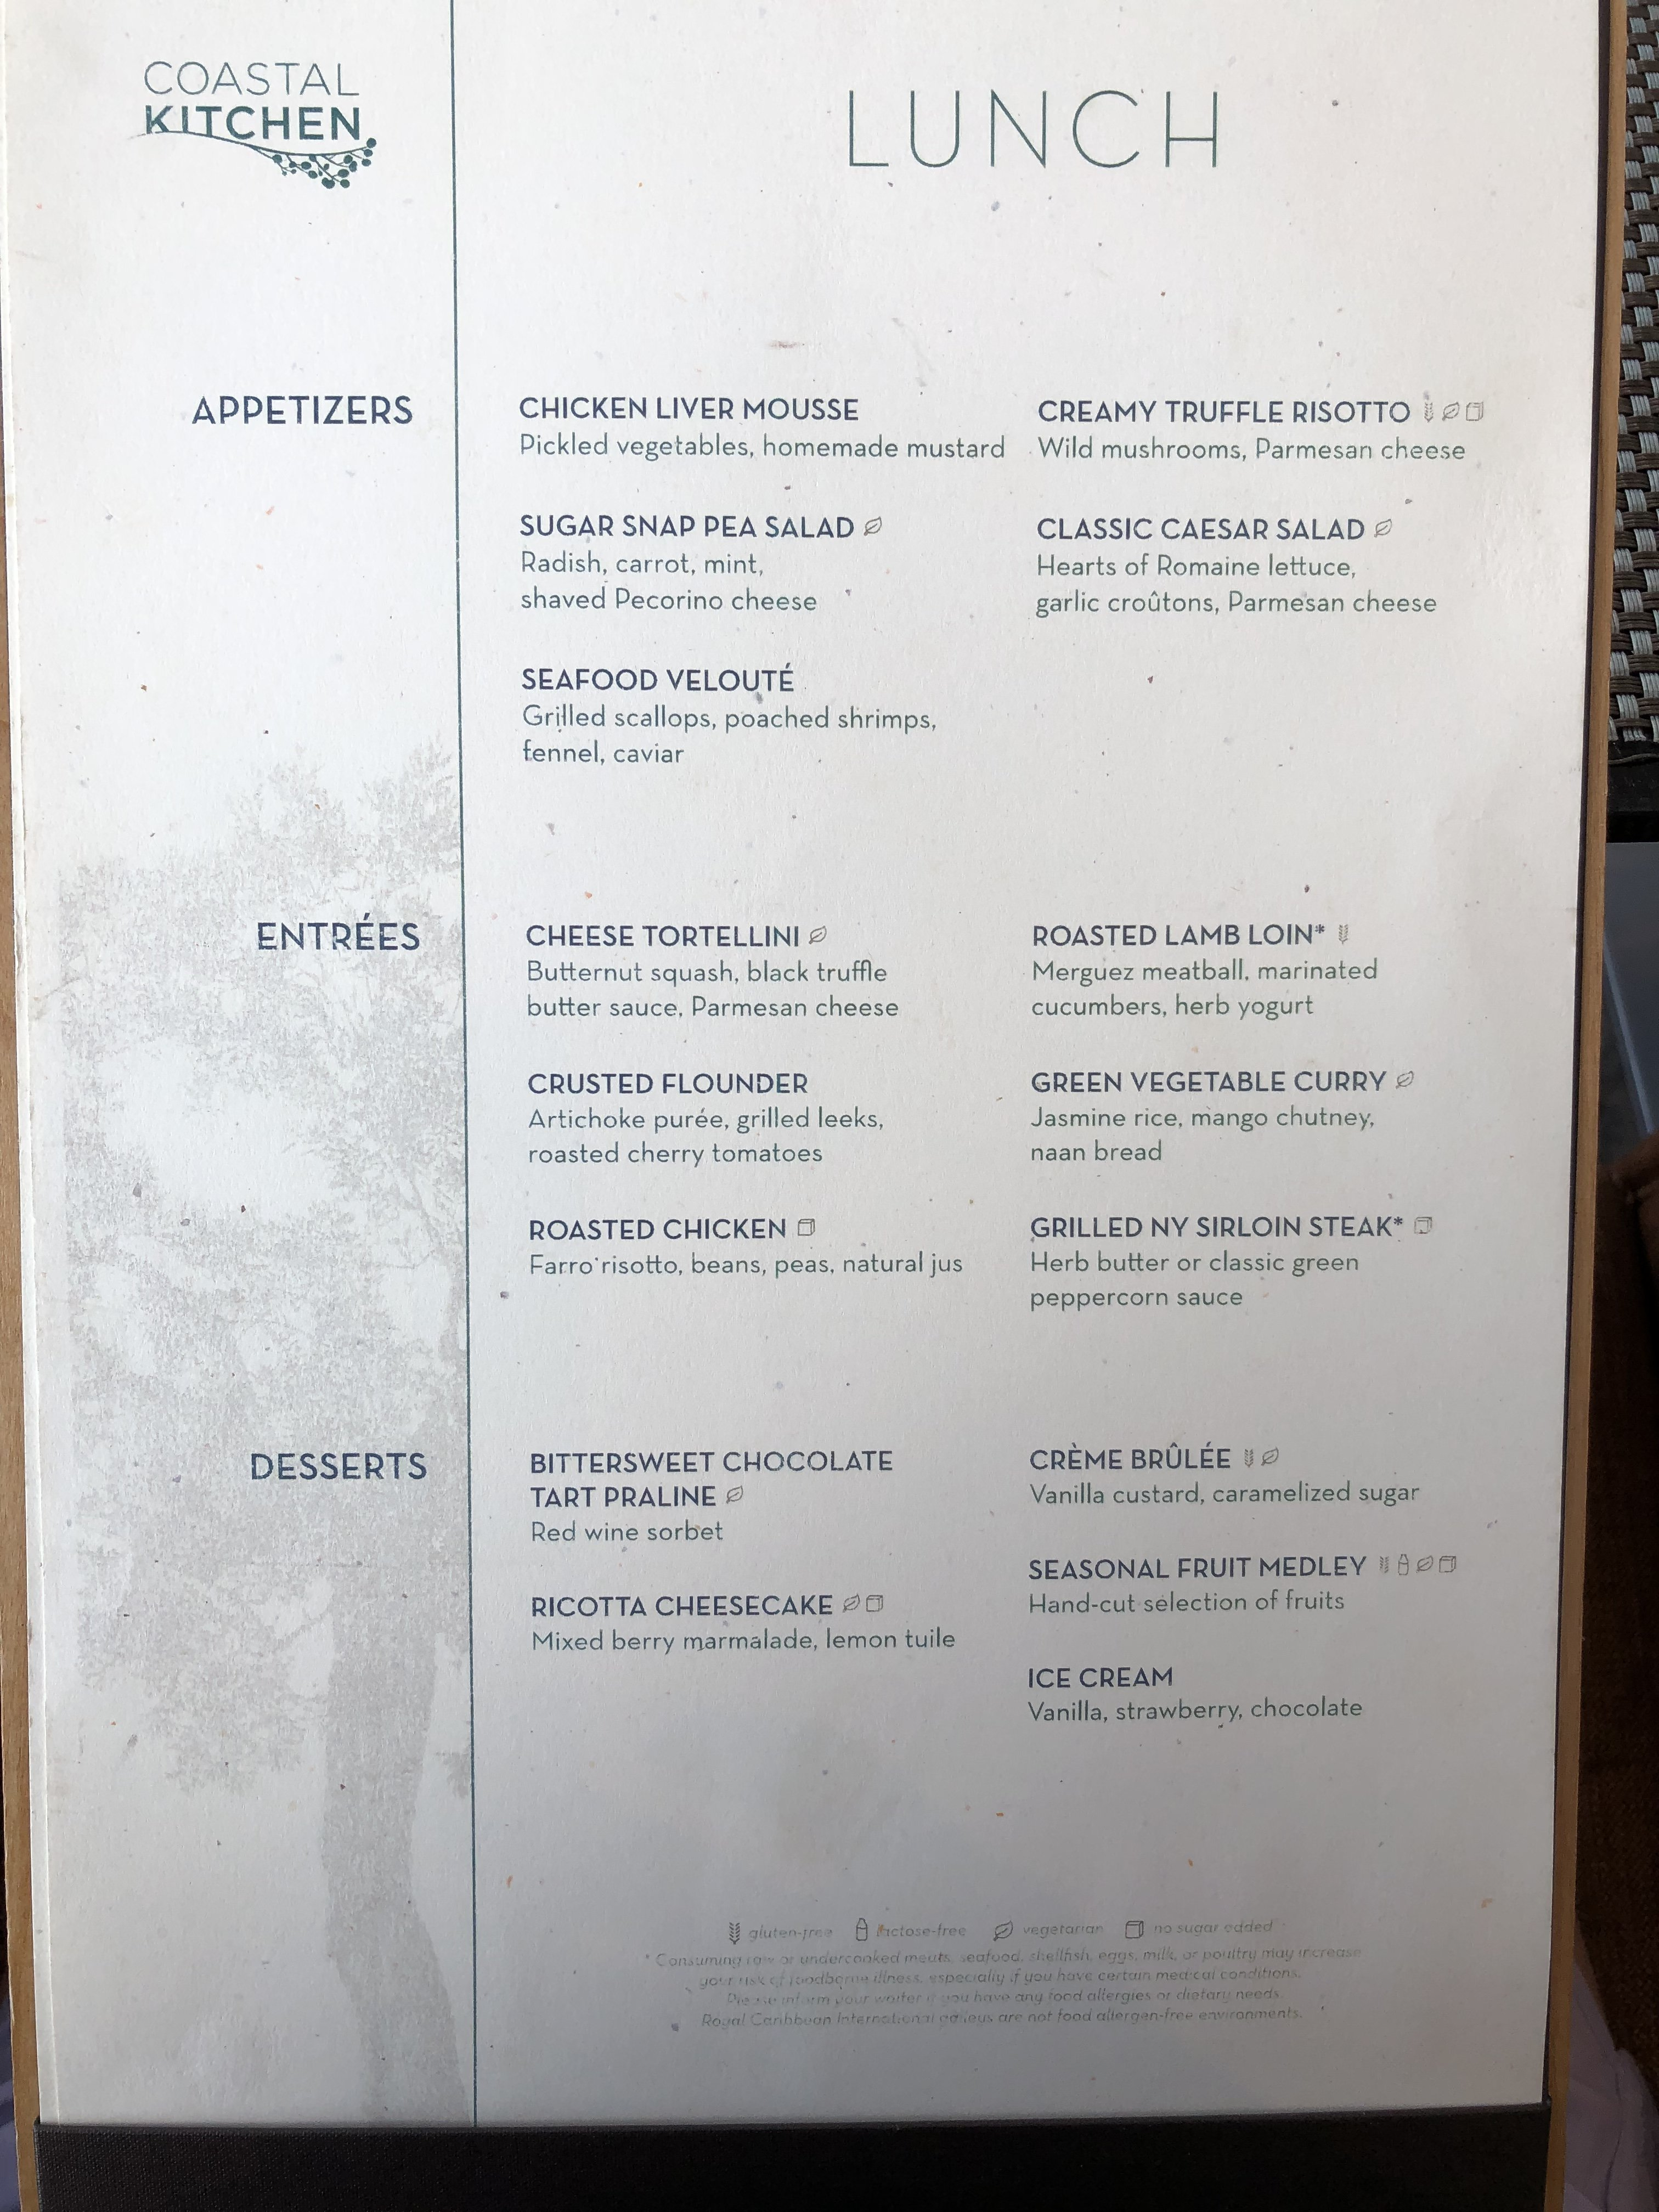 anthem of the seas coastal kitchen menu